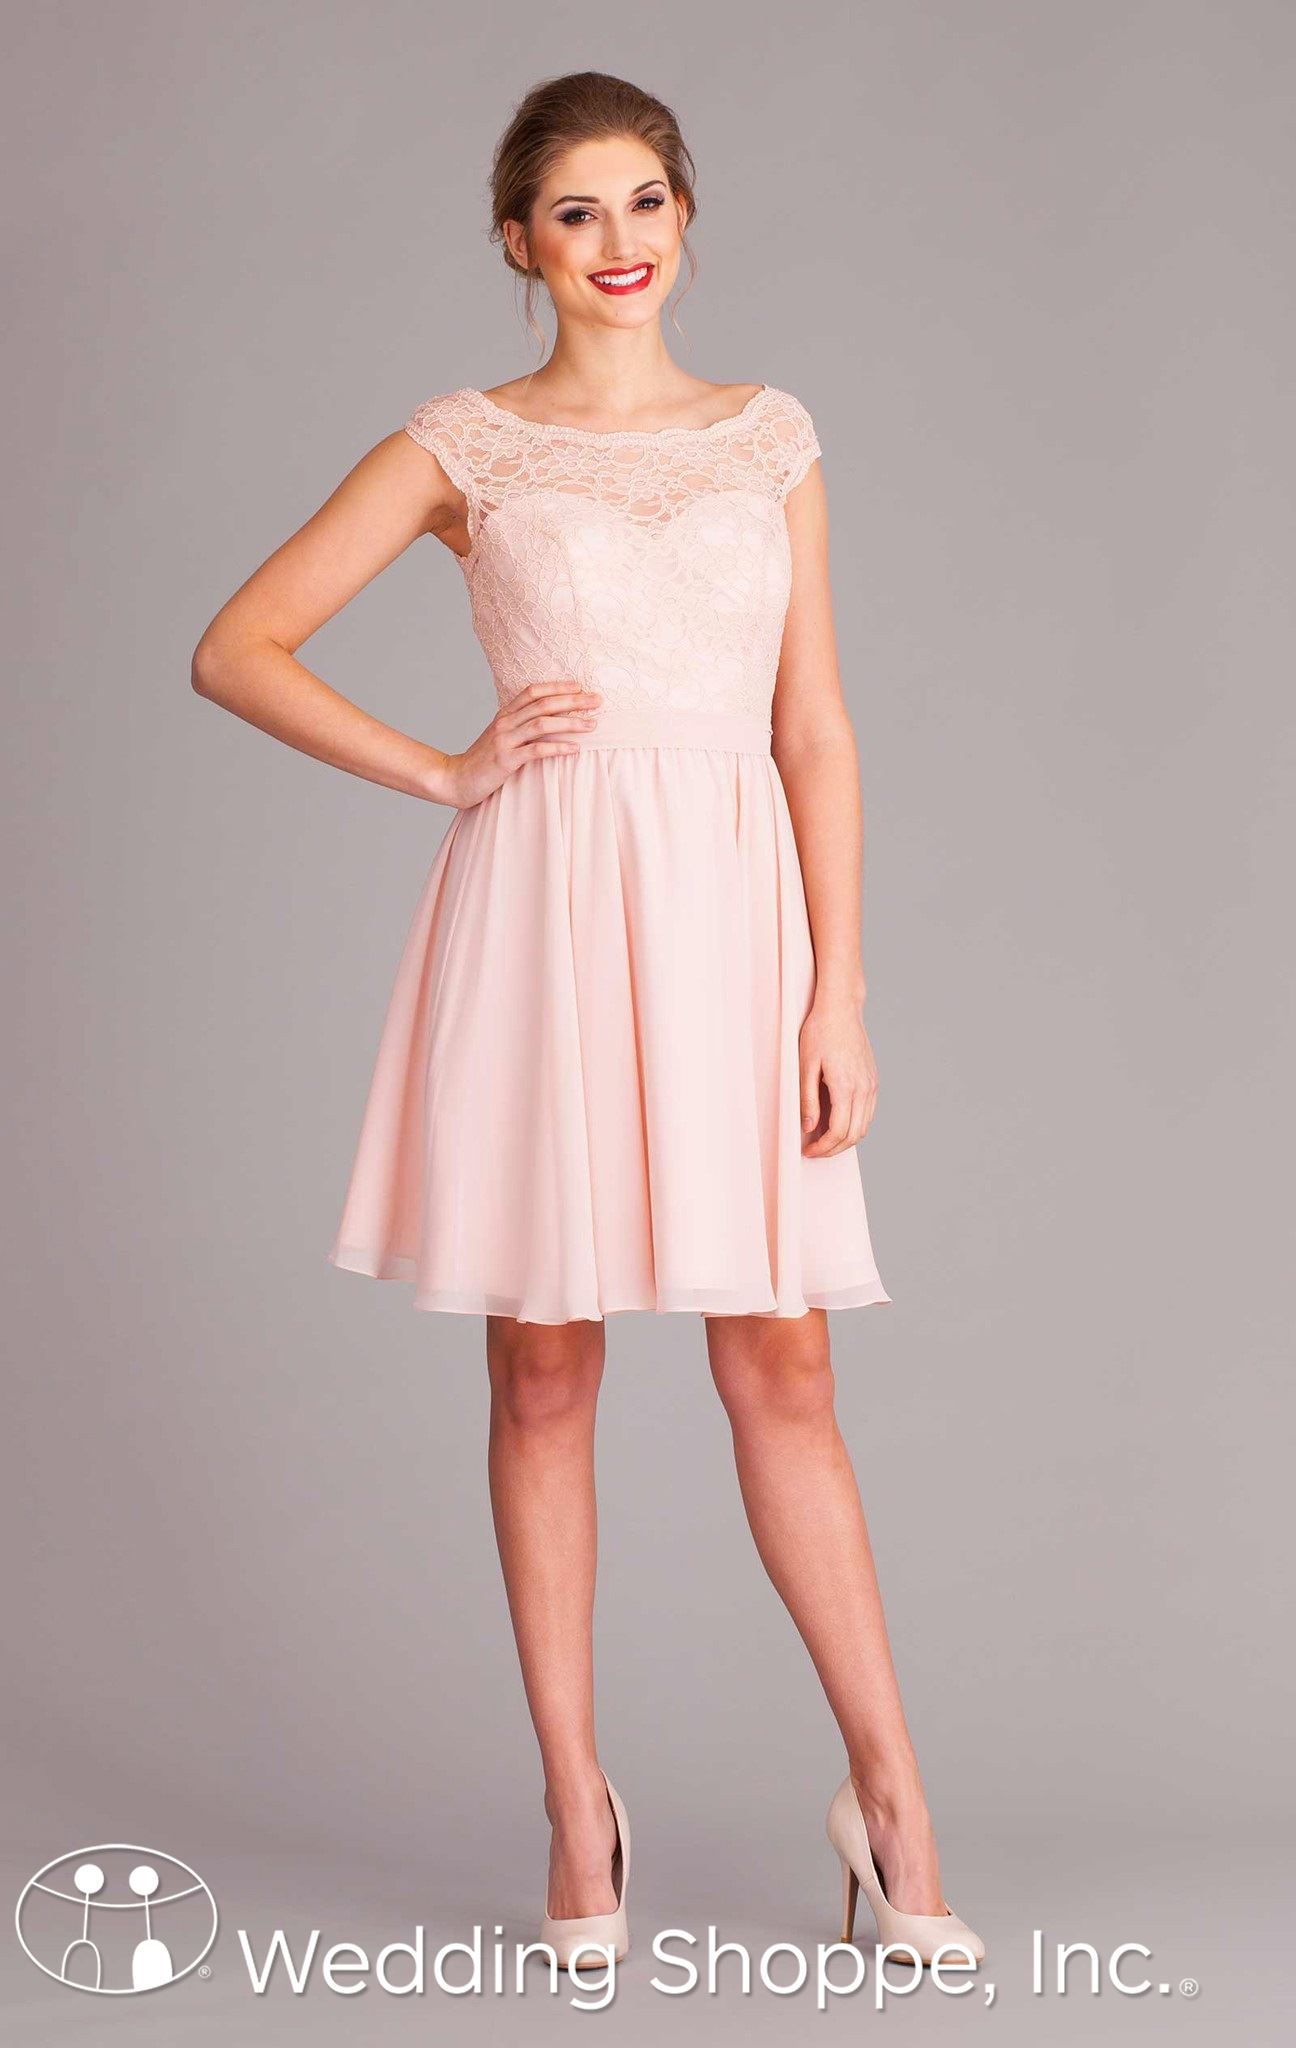 Kennedy blue bridesmaid dress ashton 282070 love 3 kennedy blue bridesmaid dress ashton 282070 ombrellifo Images